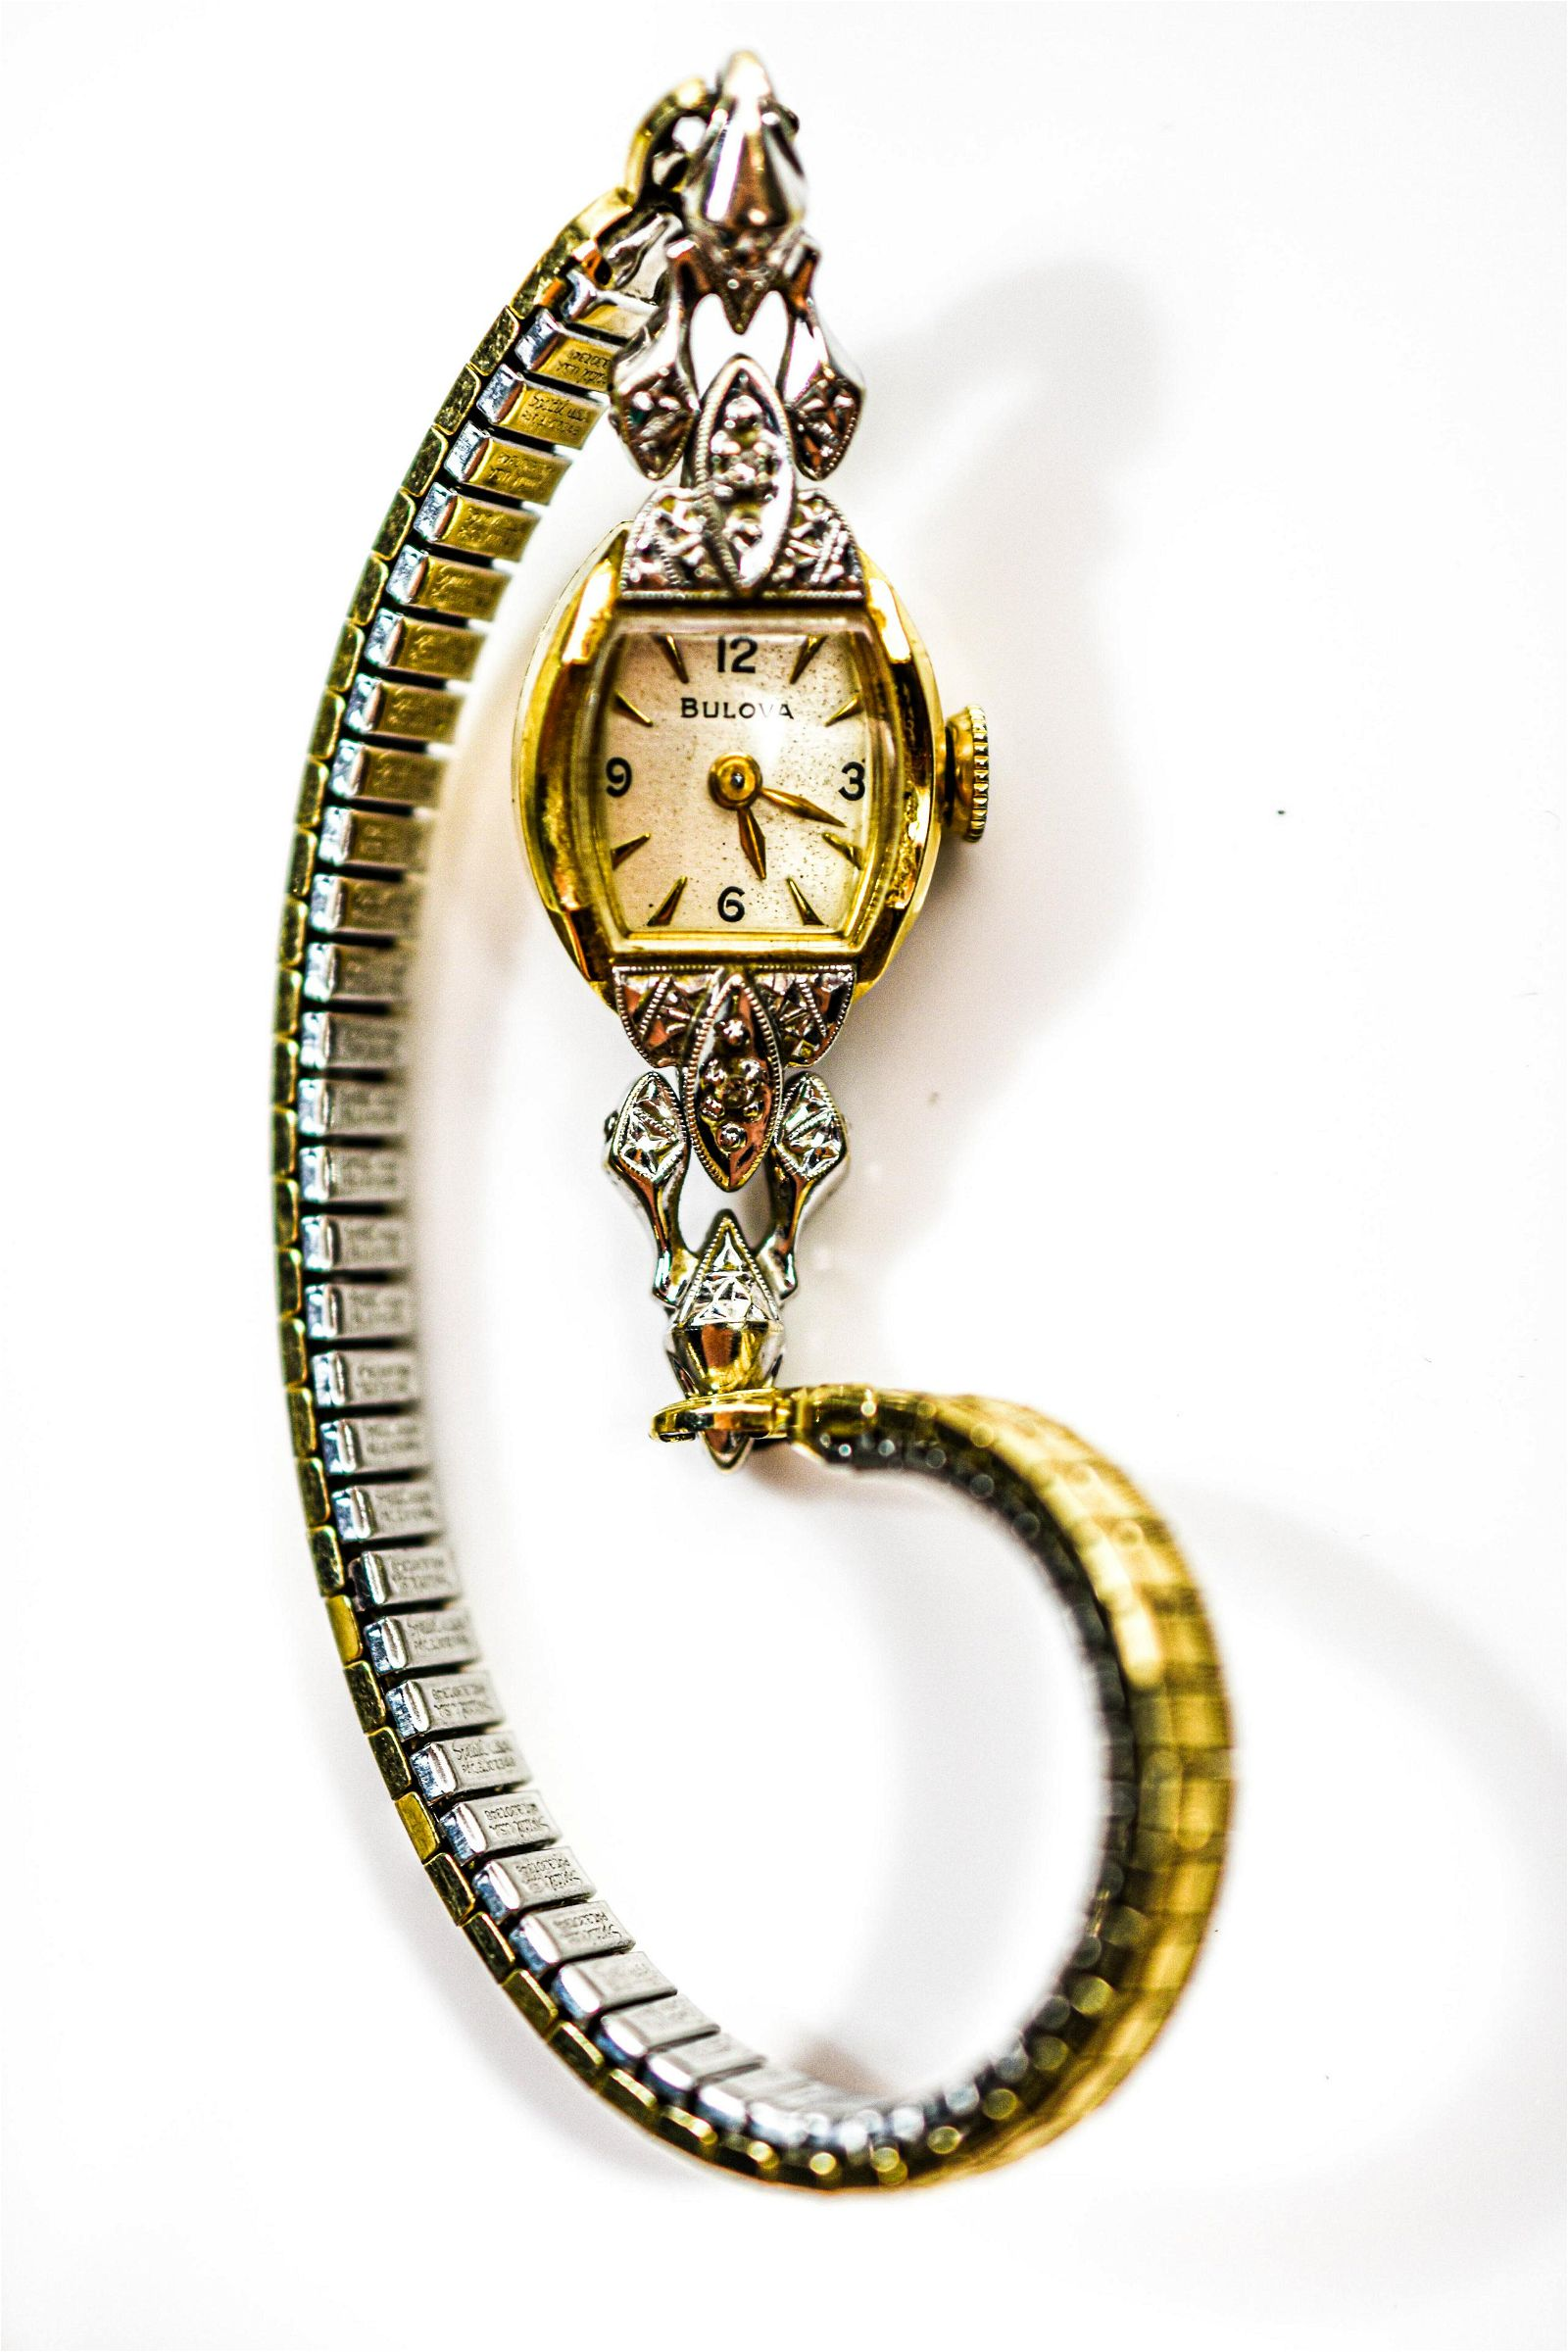 14K Yellow Gold Bulova Ladies Wrist Watch